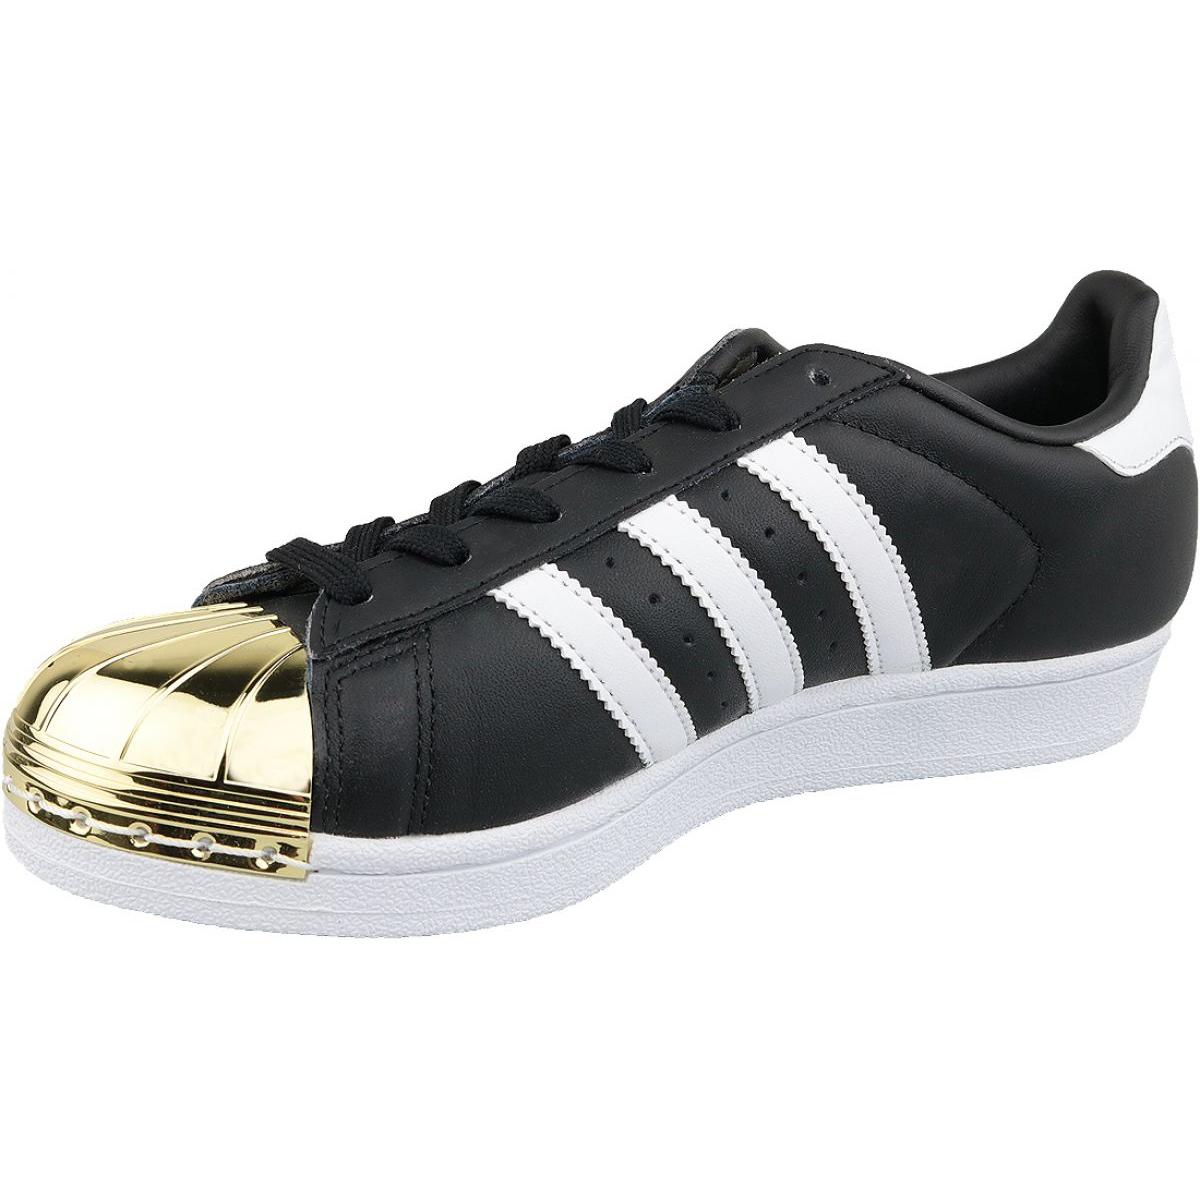 Toe Superstar Metal Bb5115 Adidas Chaussures Noir W Rj5AL34q